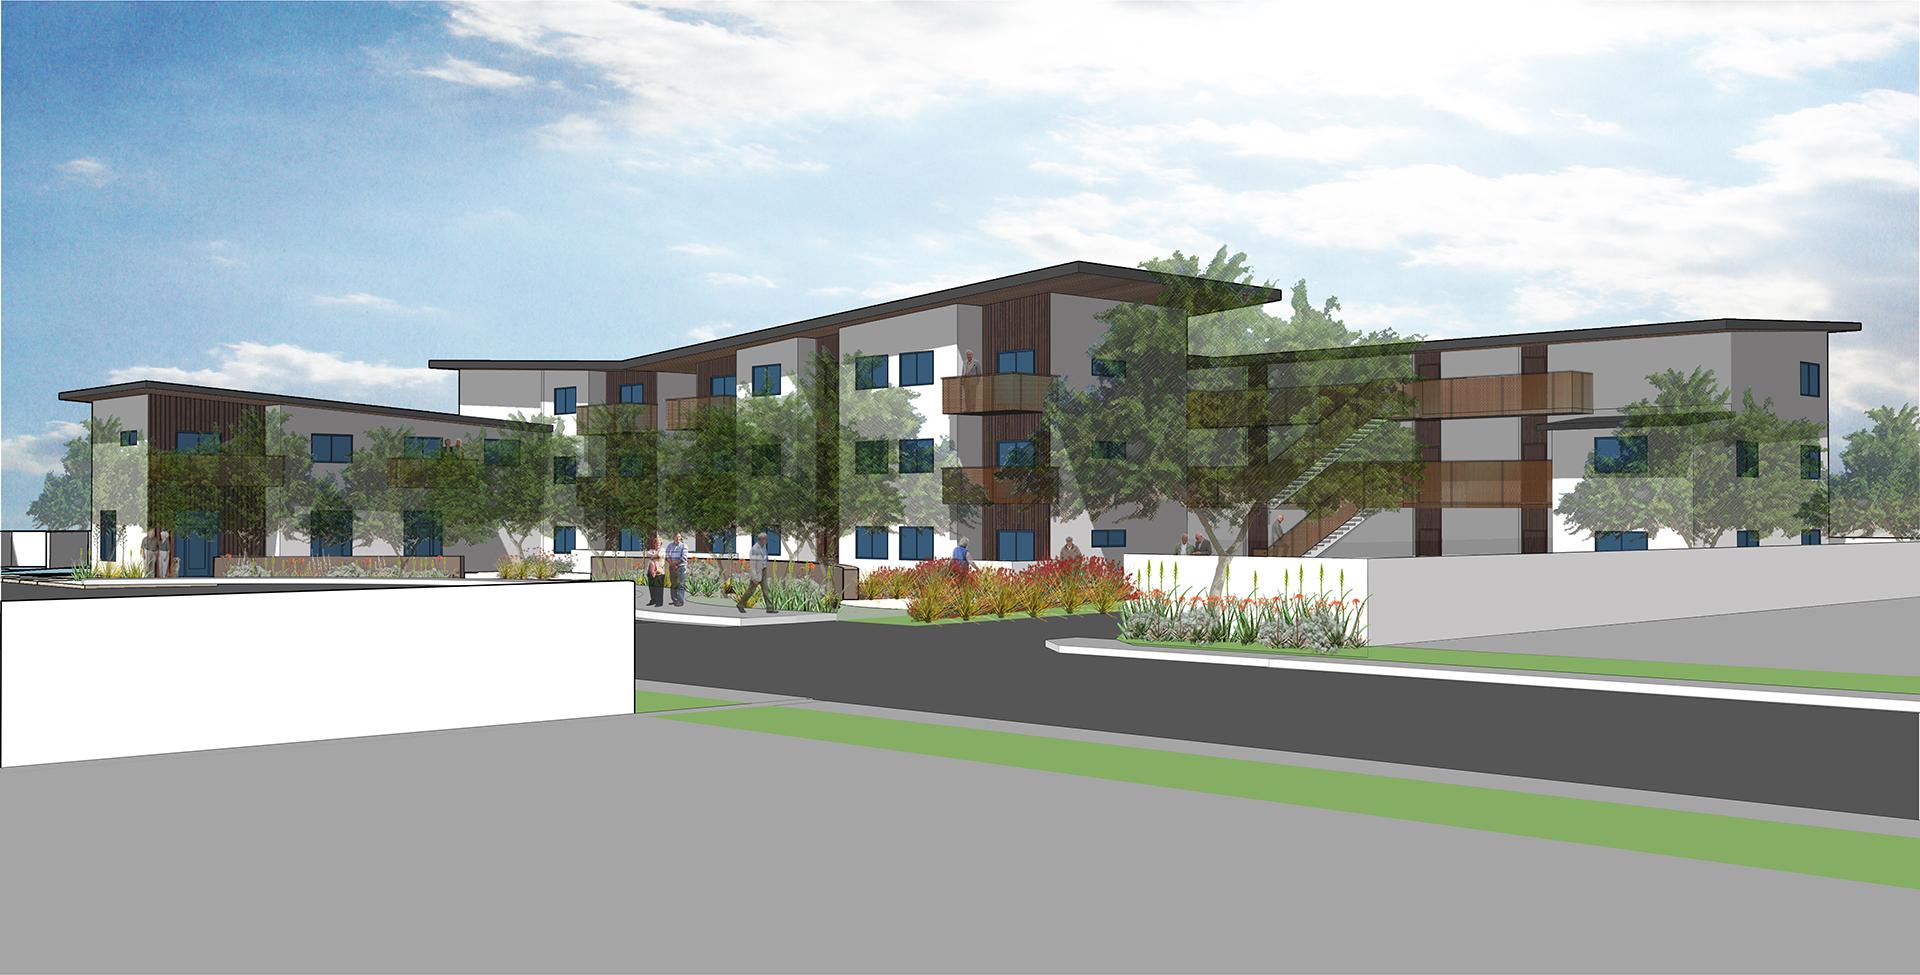 Rosewood Affordable Senior Housing Harrison Architects